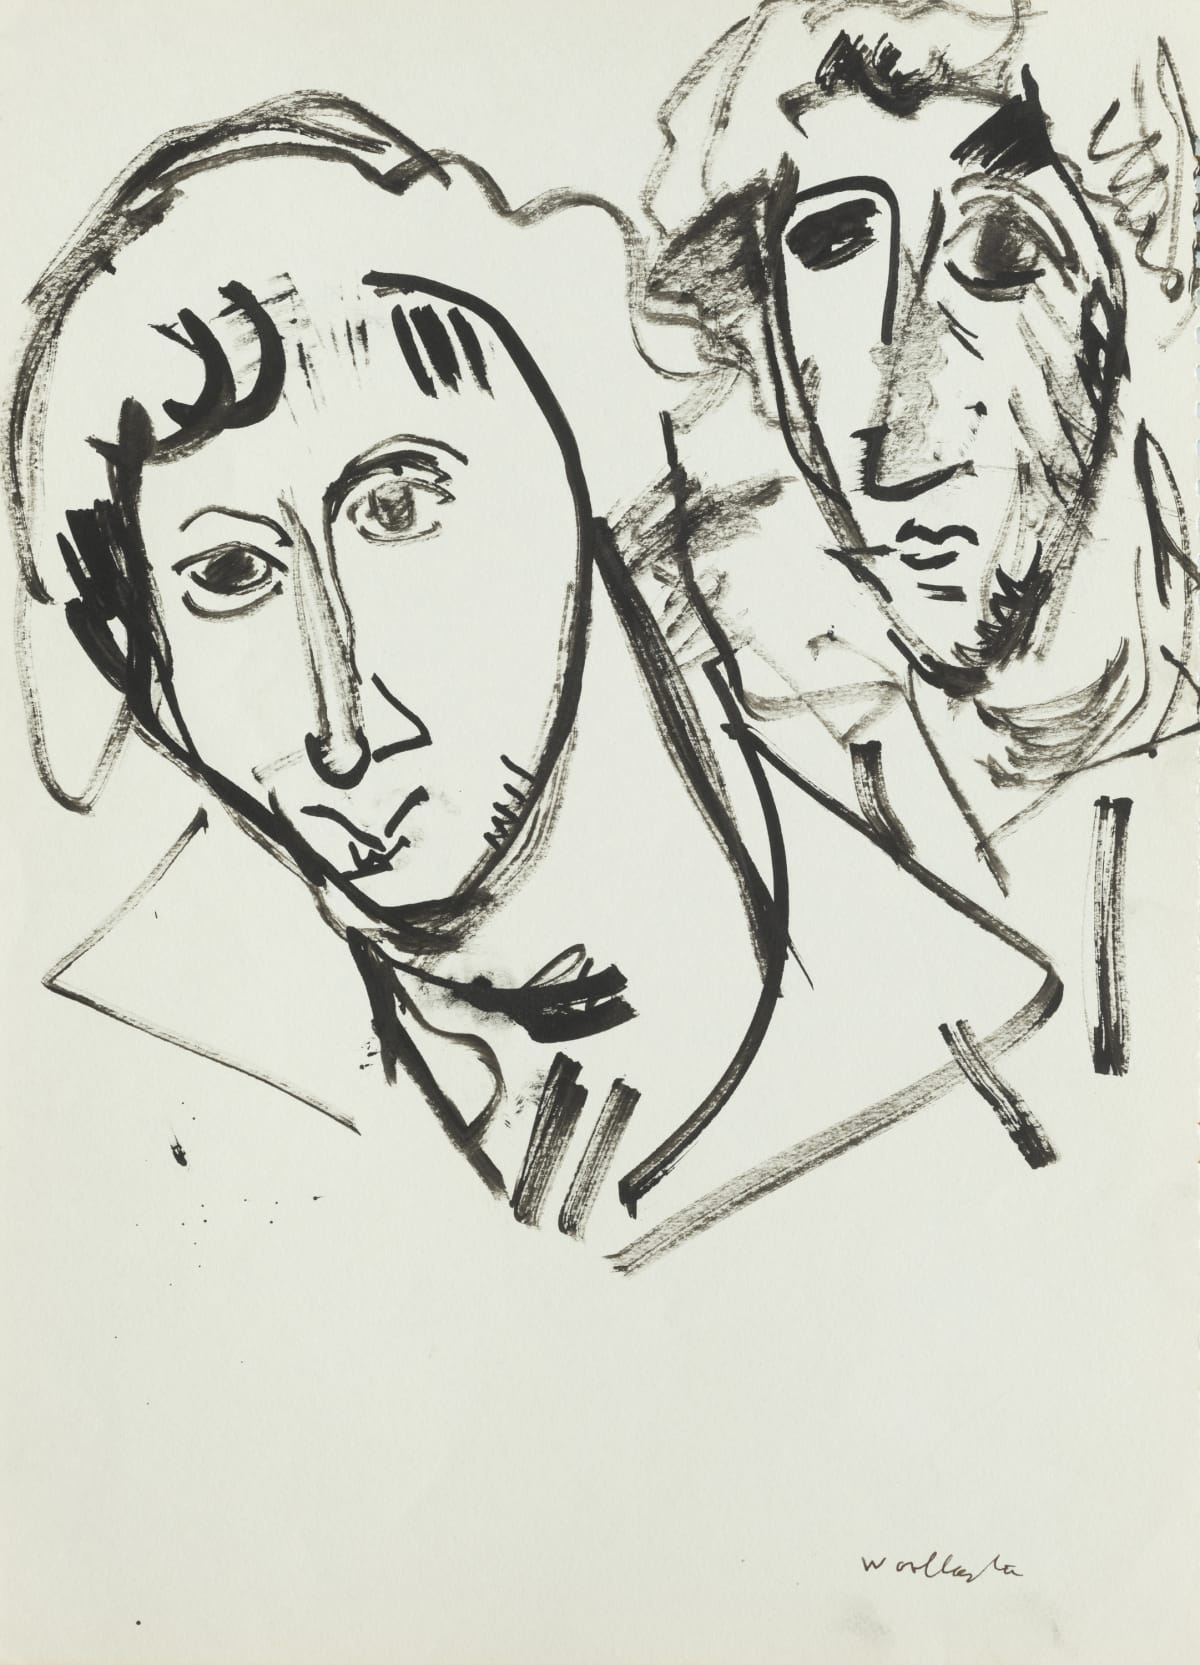 Mountford Tosswill Woollaston Sue Du Fresne, 1960 ink on paper 375mm x 275mm